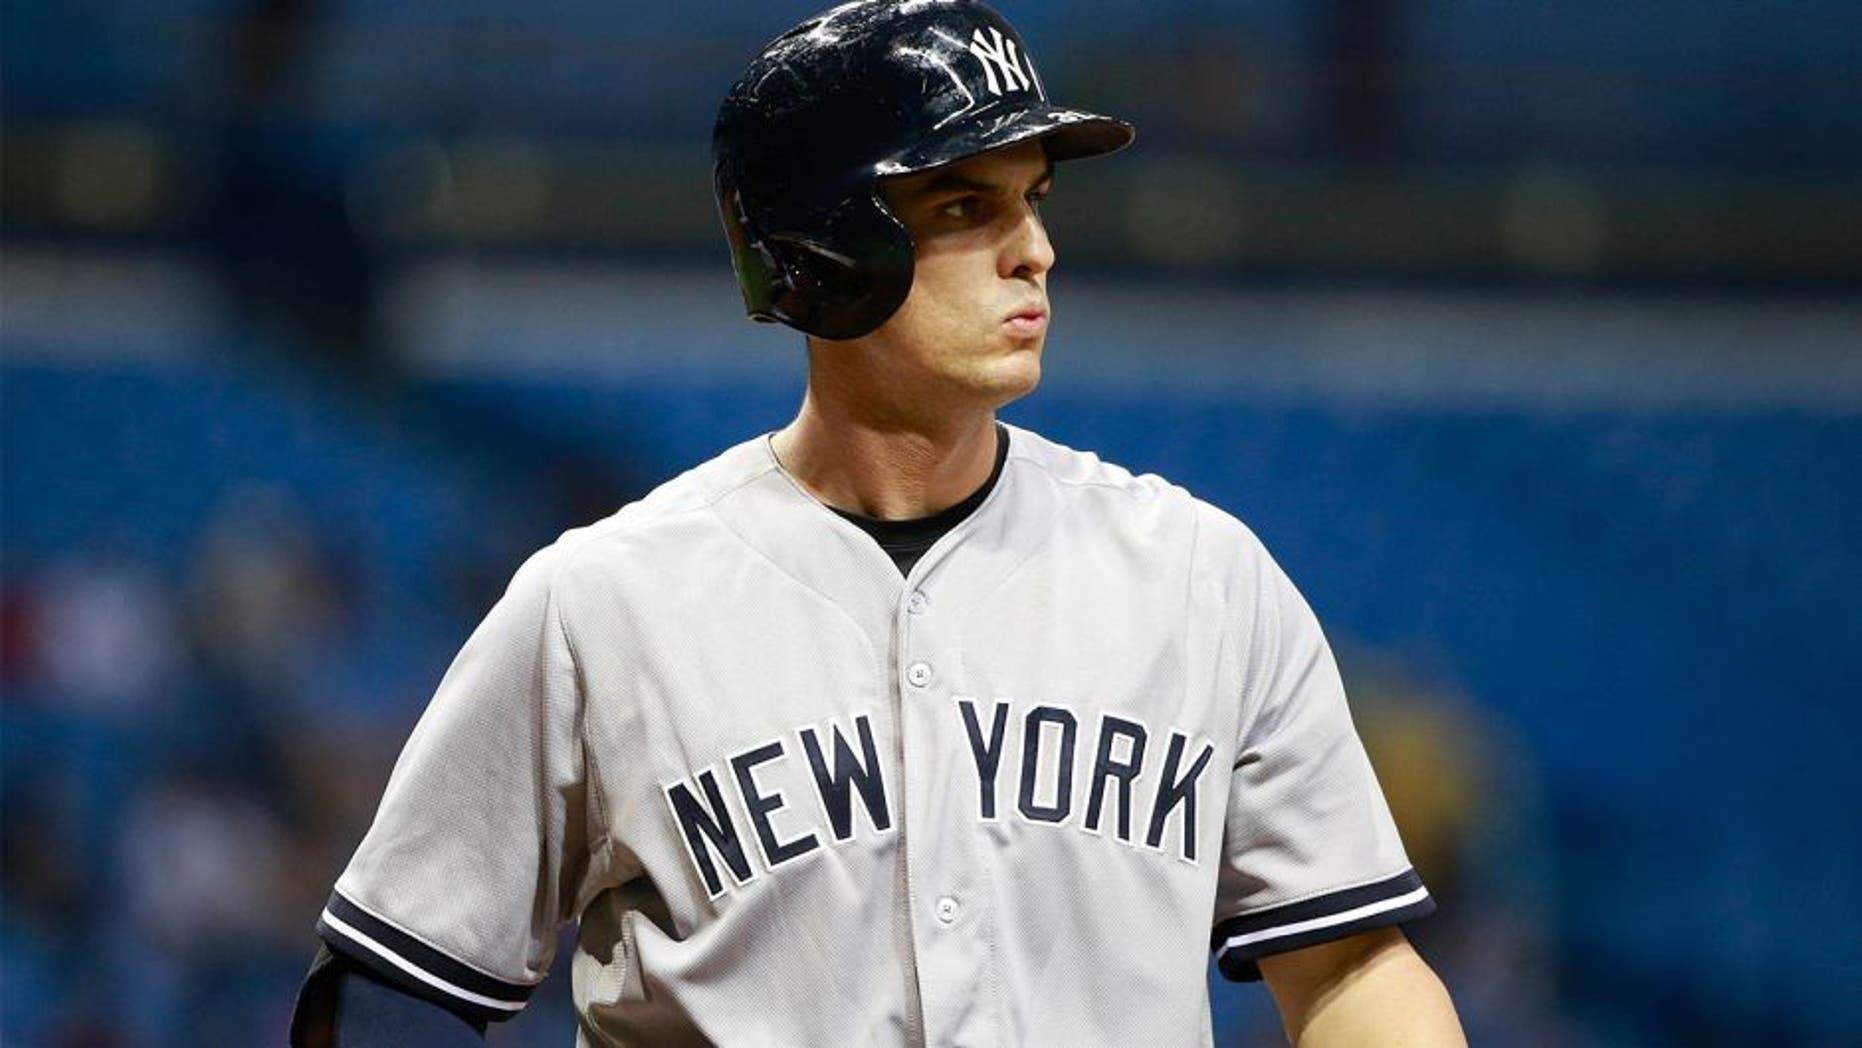 Sep 14, 2015; St. Petersburg, FL, USA; New York Yankees first baseman Greg Bird (31) at bat at Tropicana Field. Mandatory Credit: Kim Klement-USA TODAY Sports